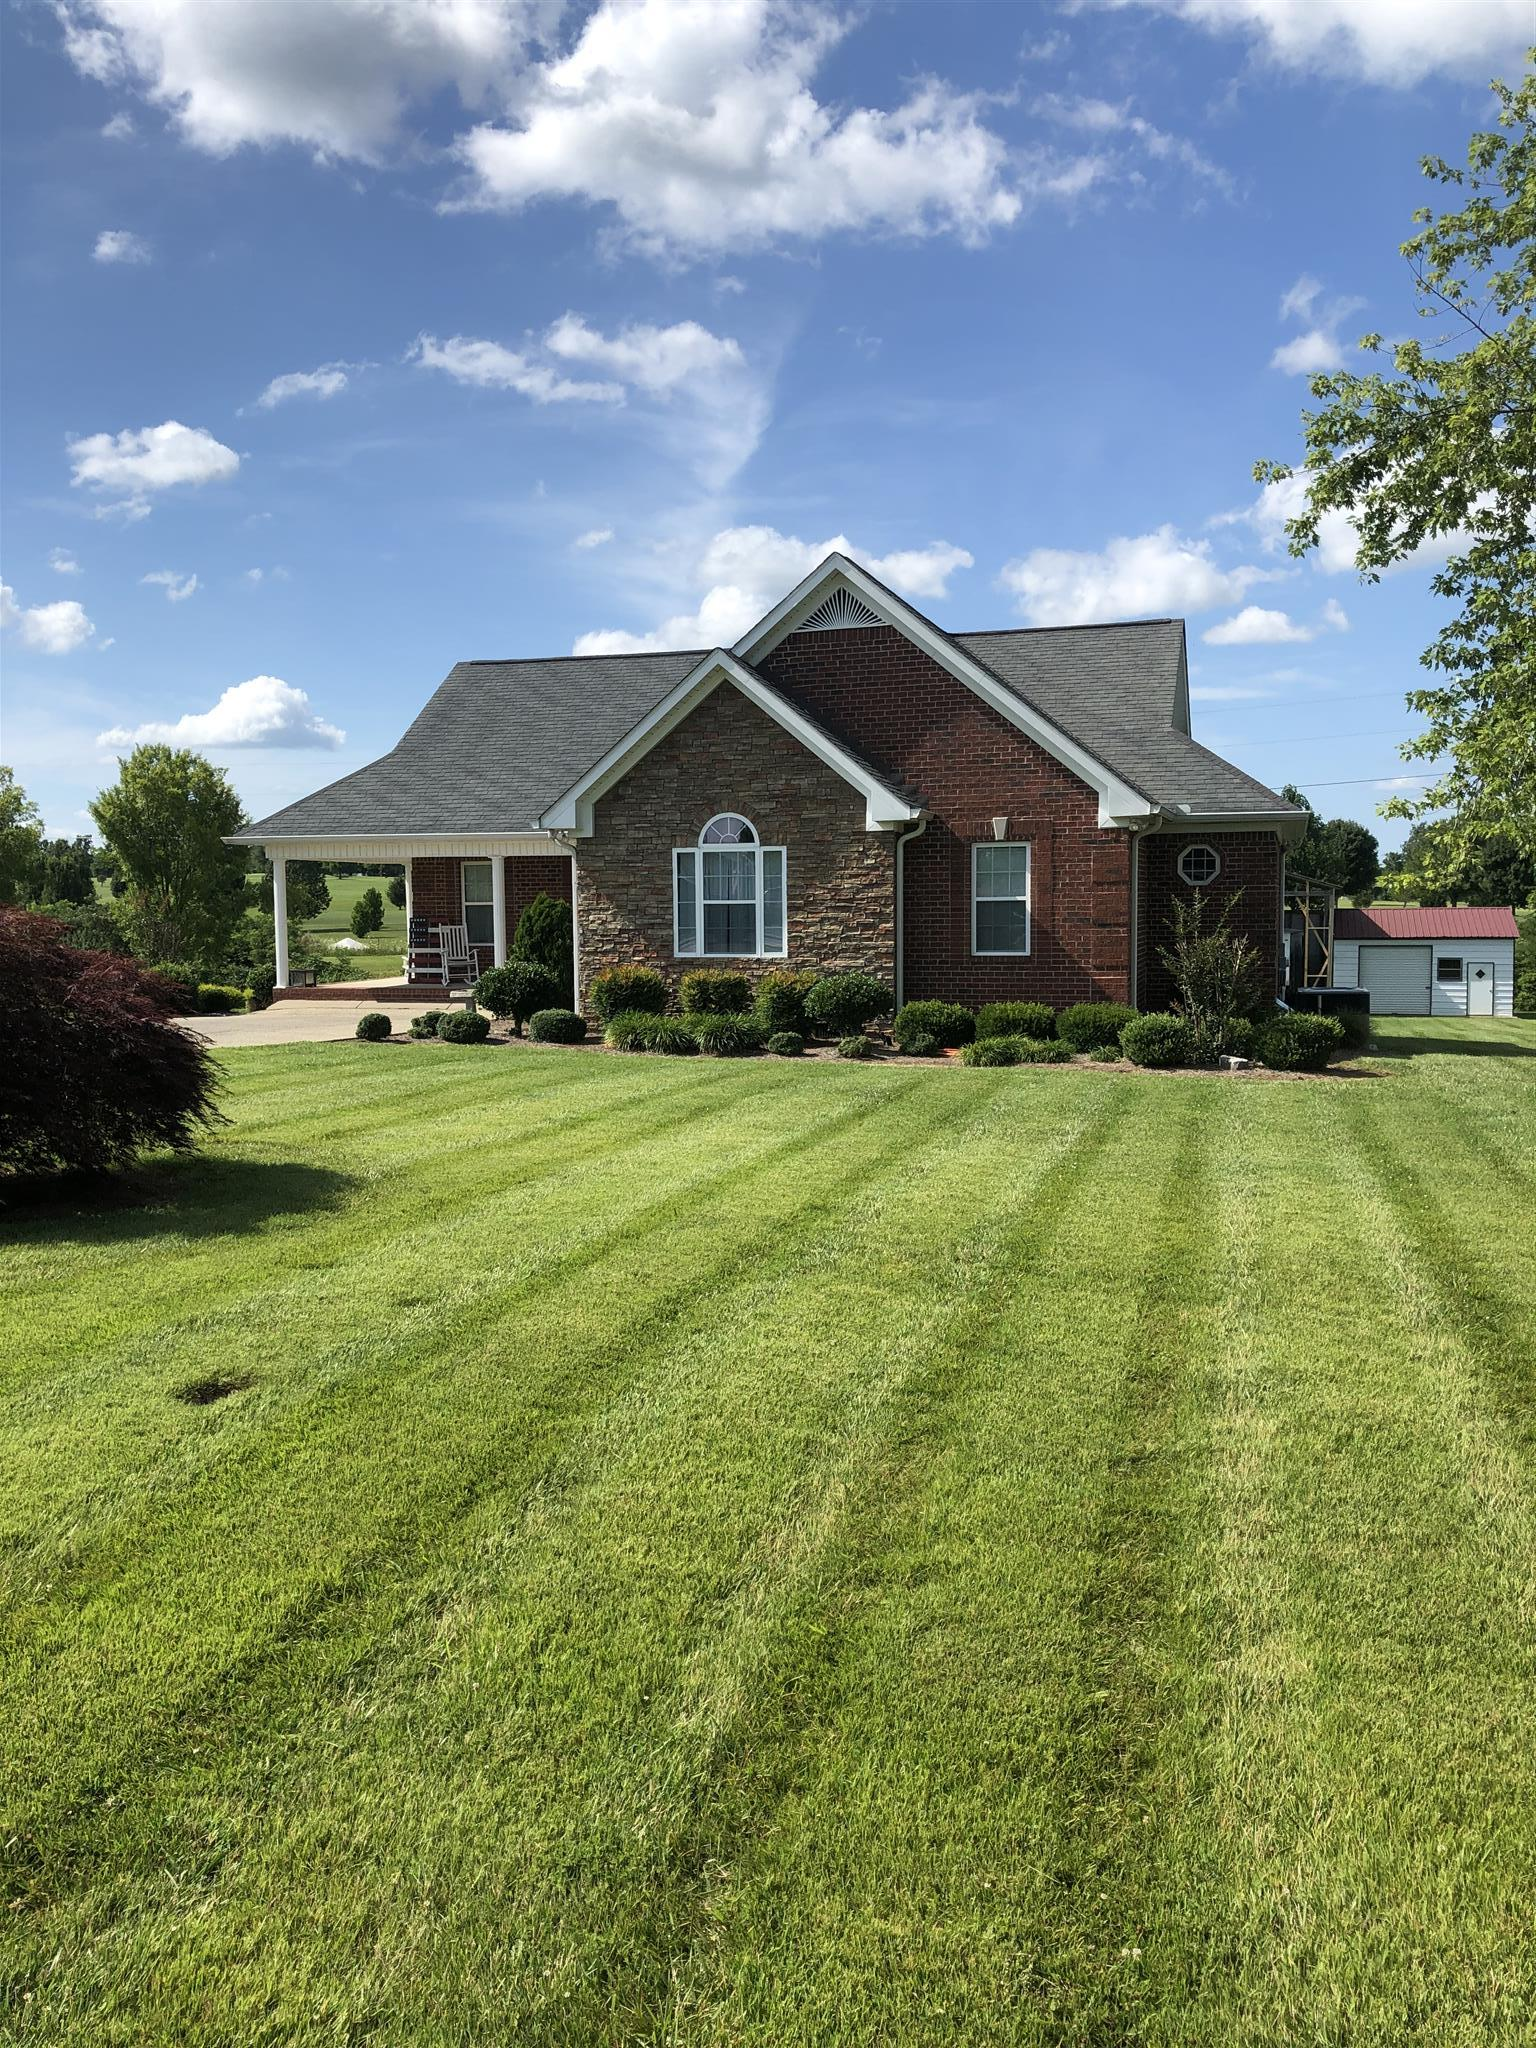 704 Parker Ln, Lafayette, TN 37083 - Lafayette, TN real estate listing